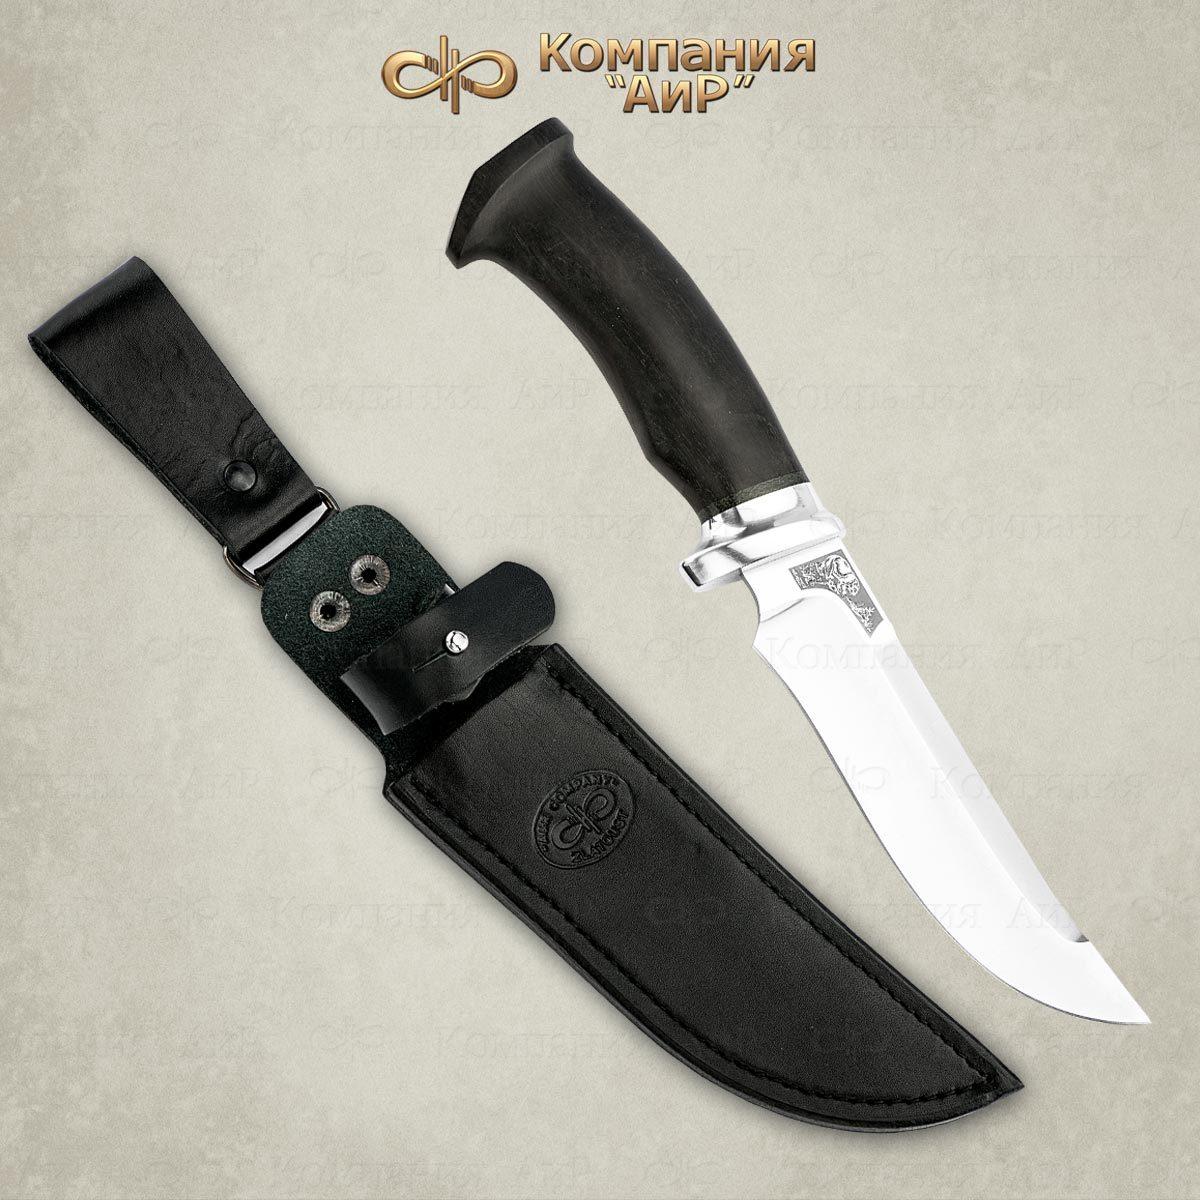 Фото - Нож разделочный АиР Росомаха, сталь 110х18 М-ШД, рукоять граб нож казацкий засапожный сталь 110х18 рукоять граб